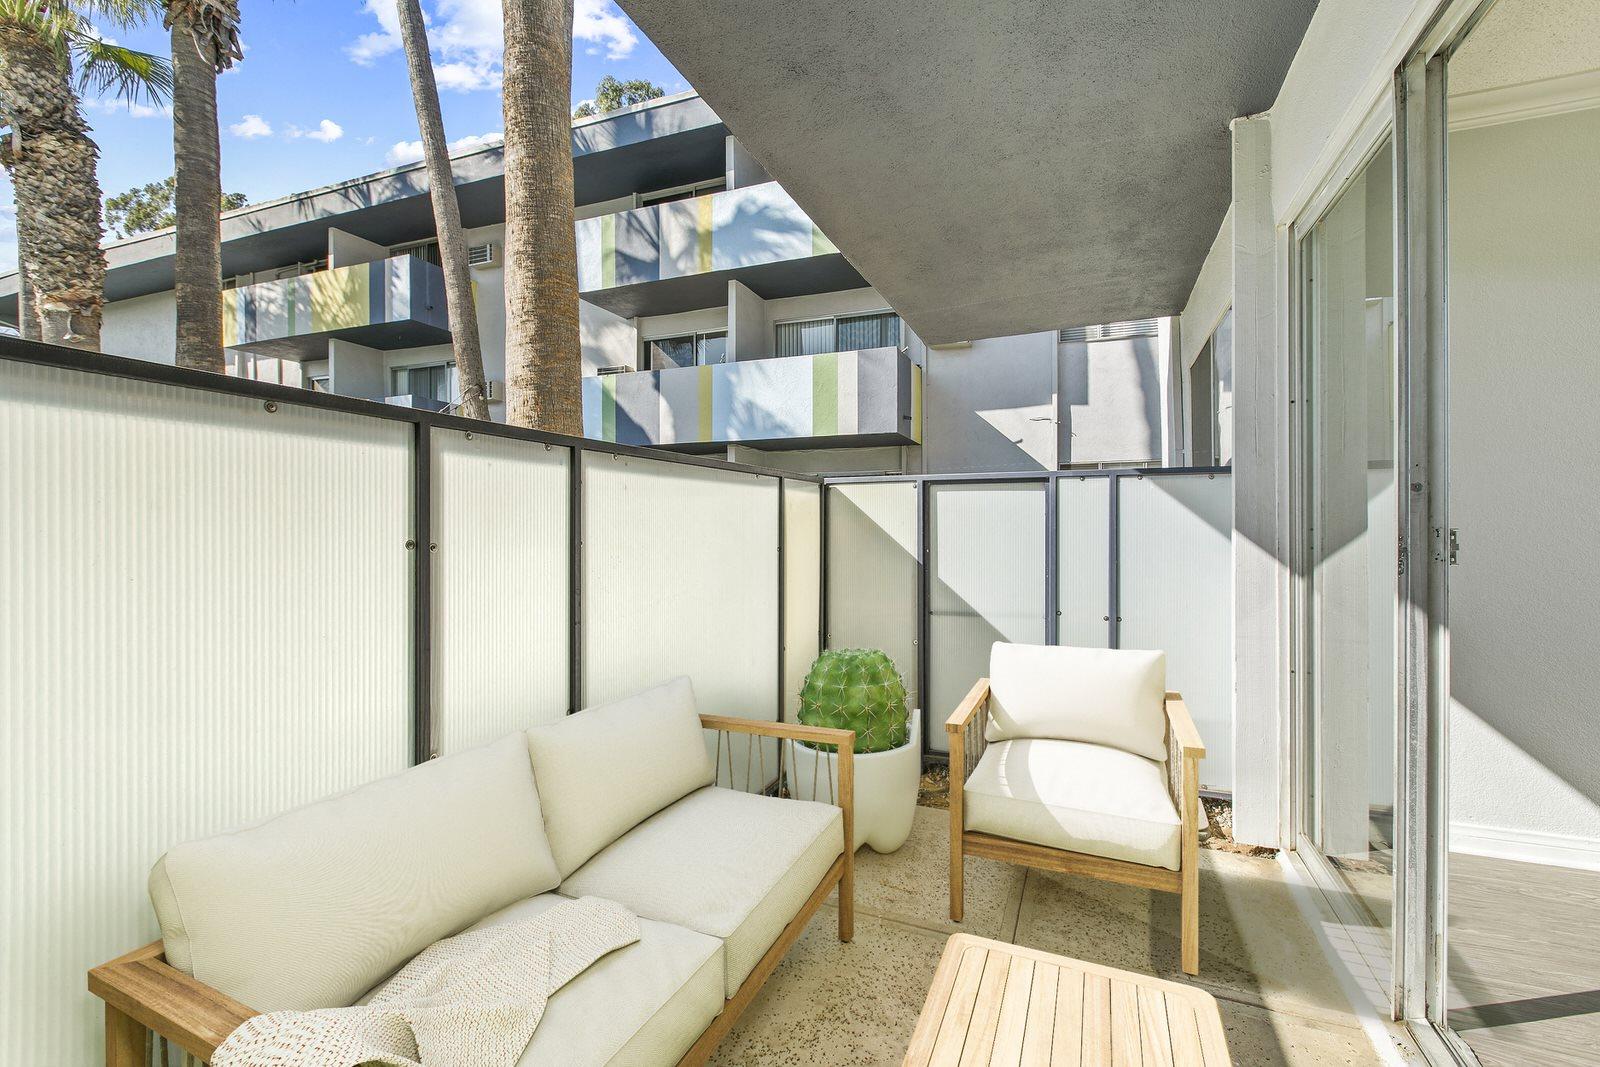 Private Patio Photo at Milano Apartments 20900 Anza Ave Torrance, CA 90503